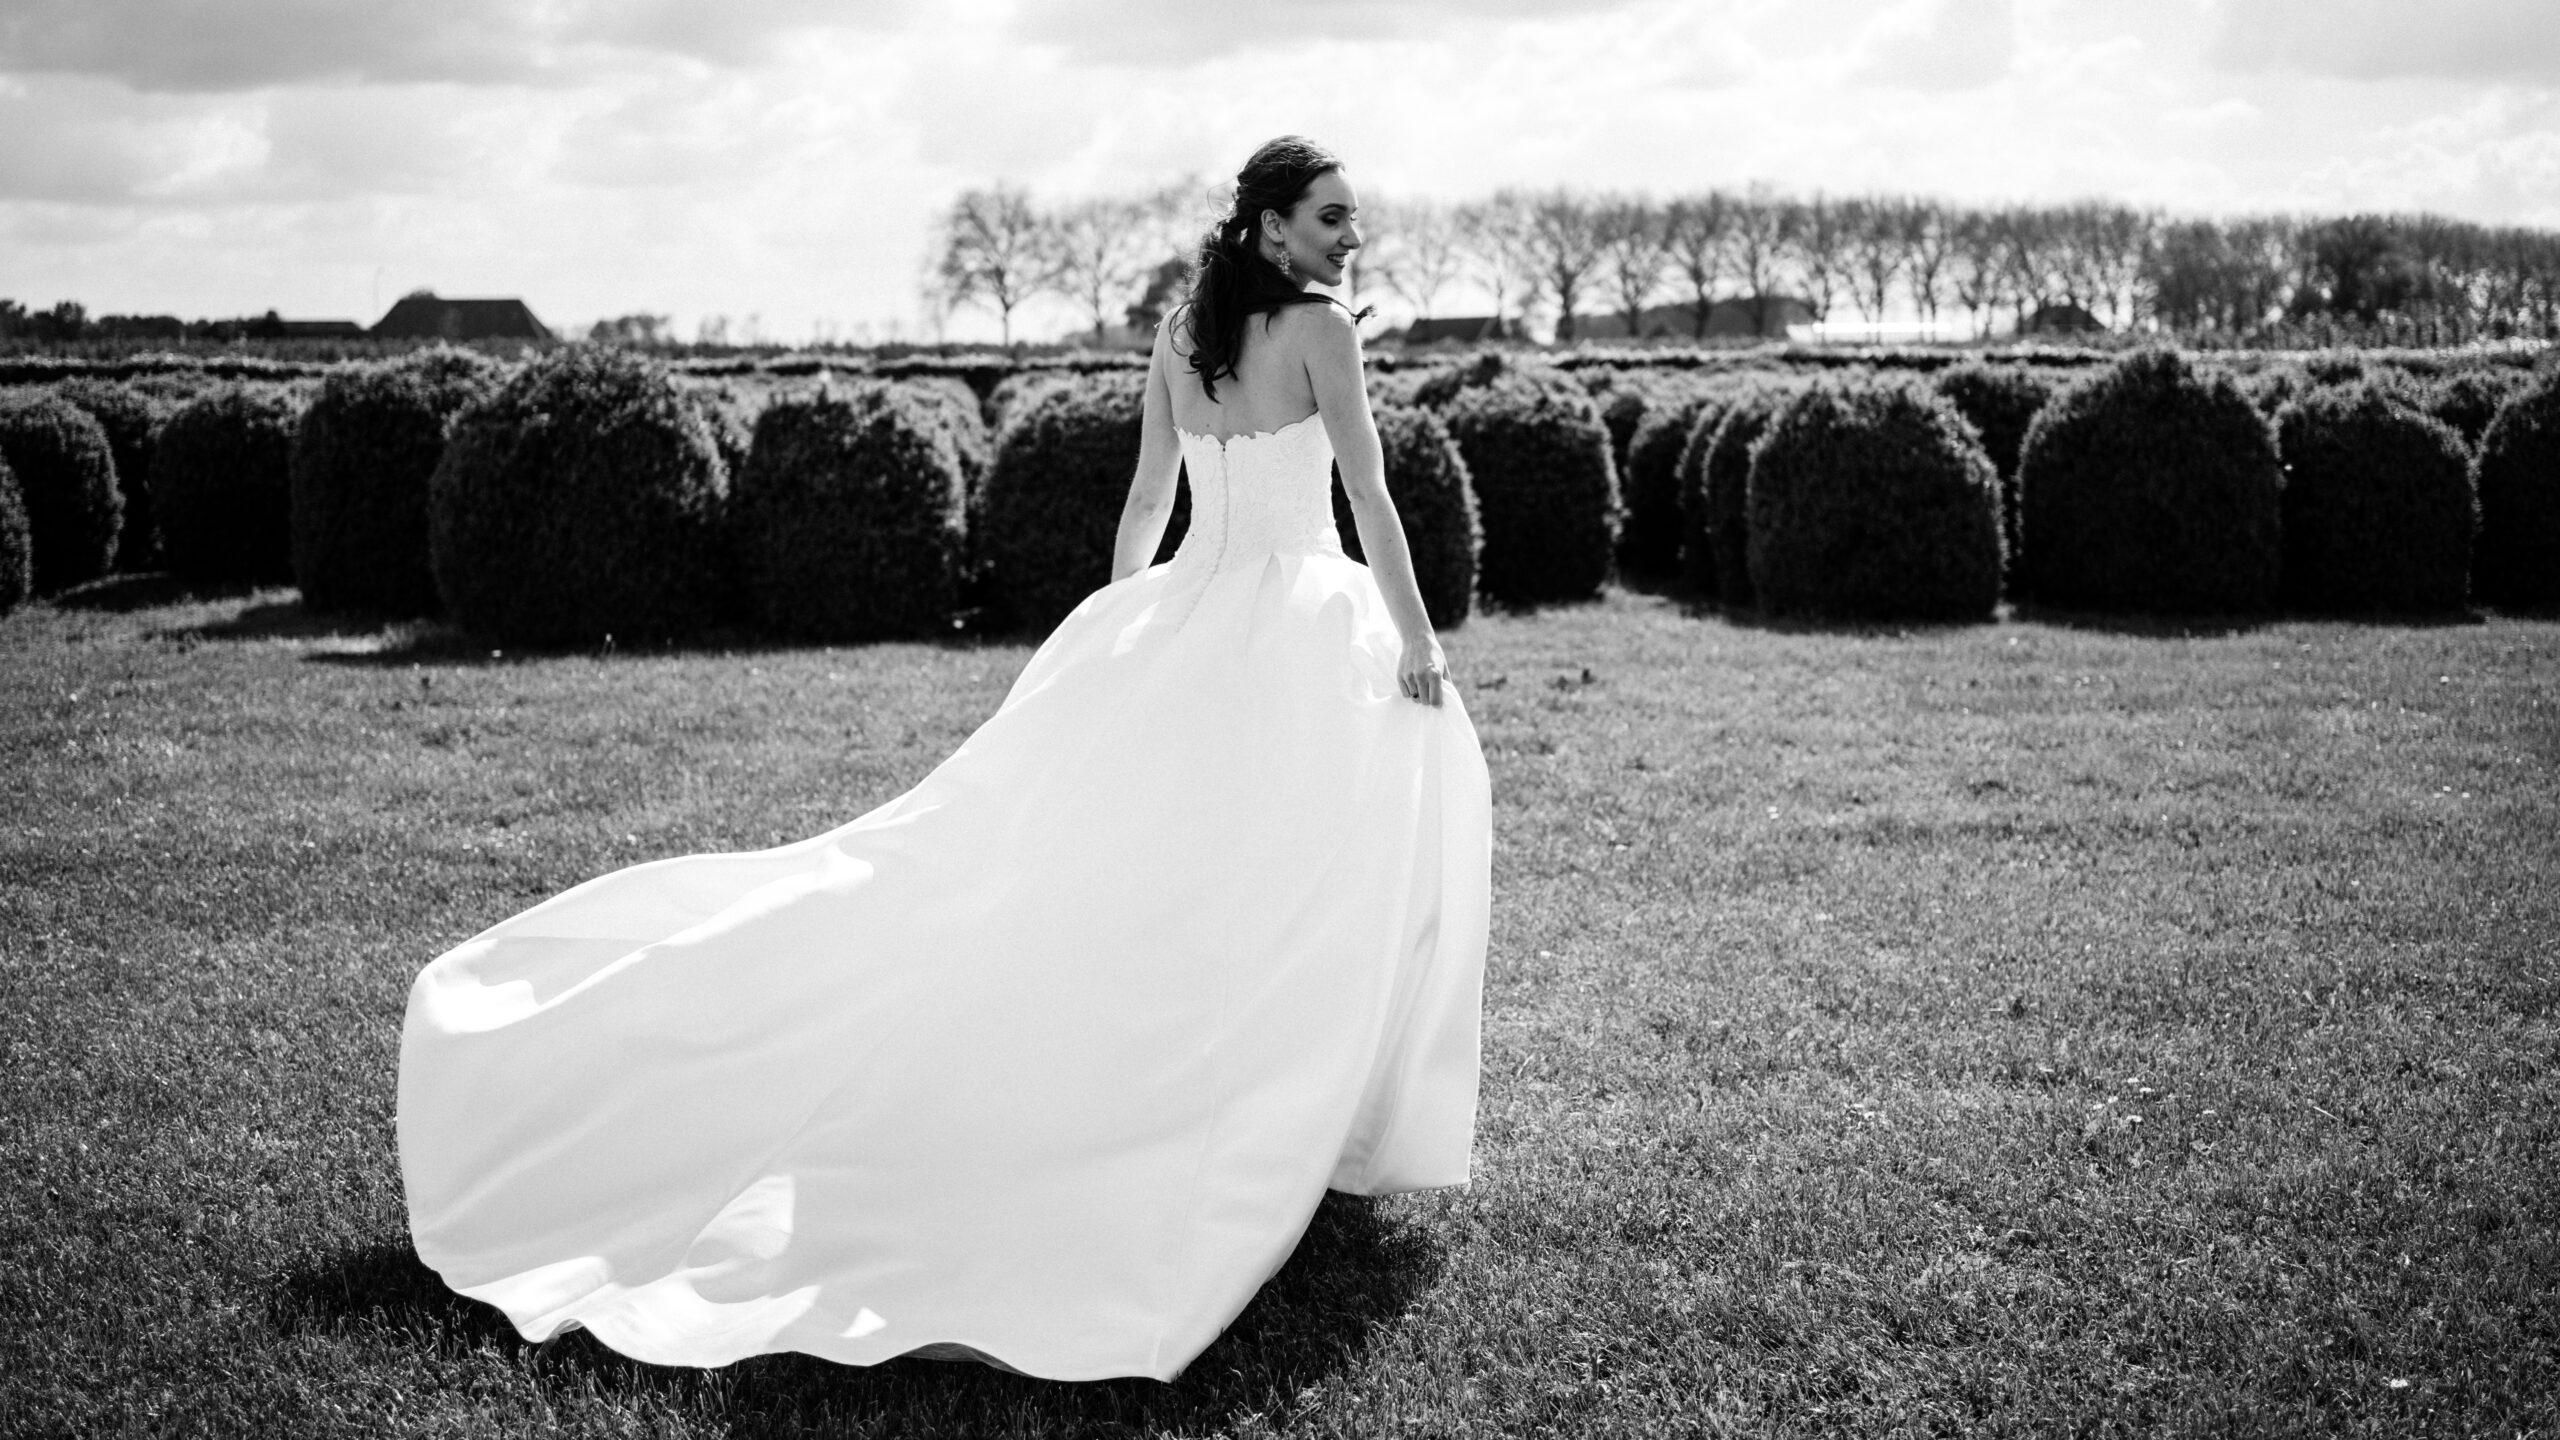 Marieke Creative Studio Ceremonie fotoHeader Fotografie Bruiloften Wedding Trouwfotograaf Bruiloft Bruidsfotografie New Born Zakelijk Fotografie Black and White